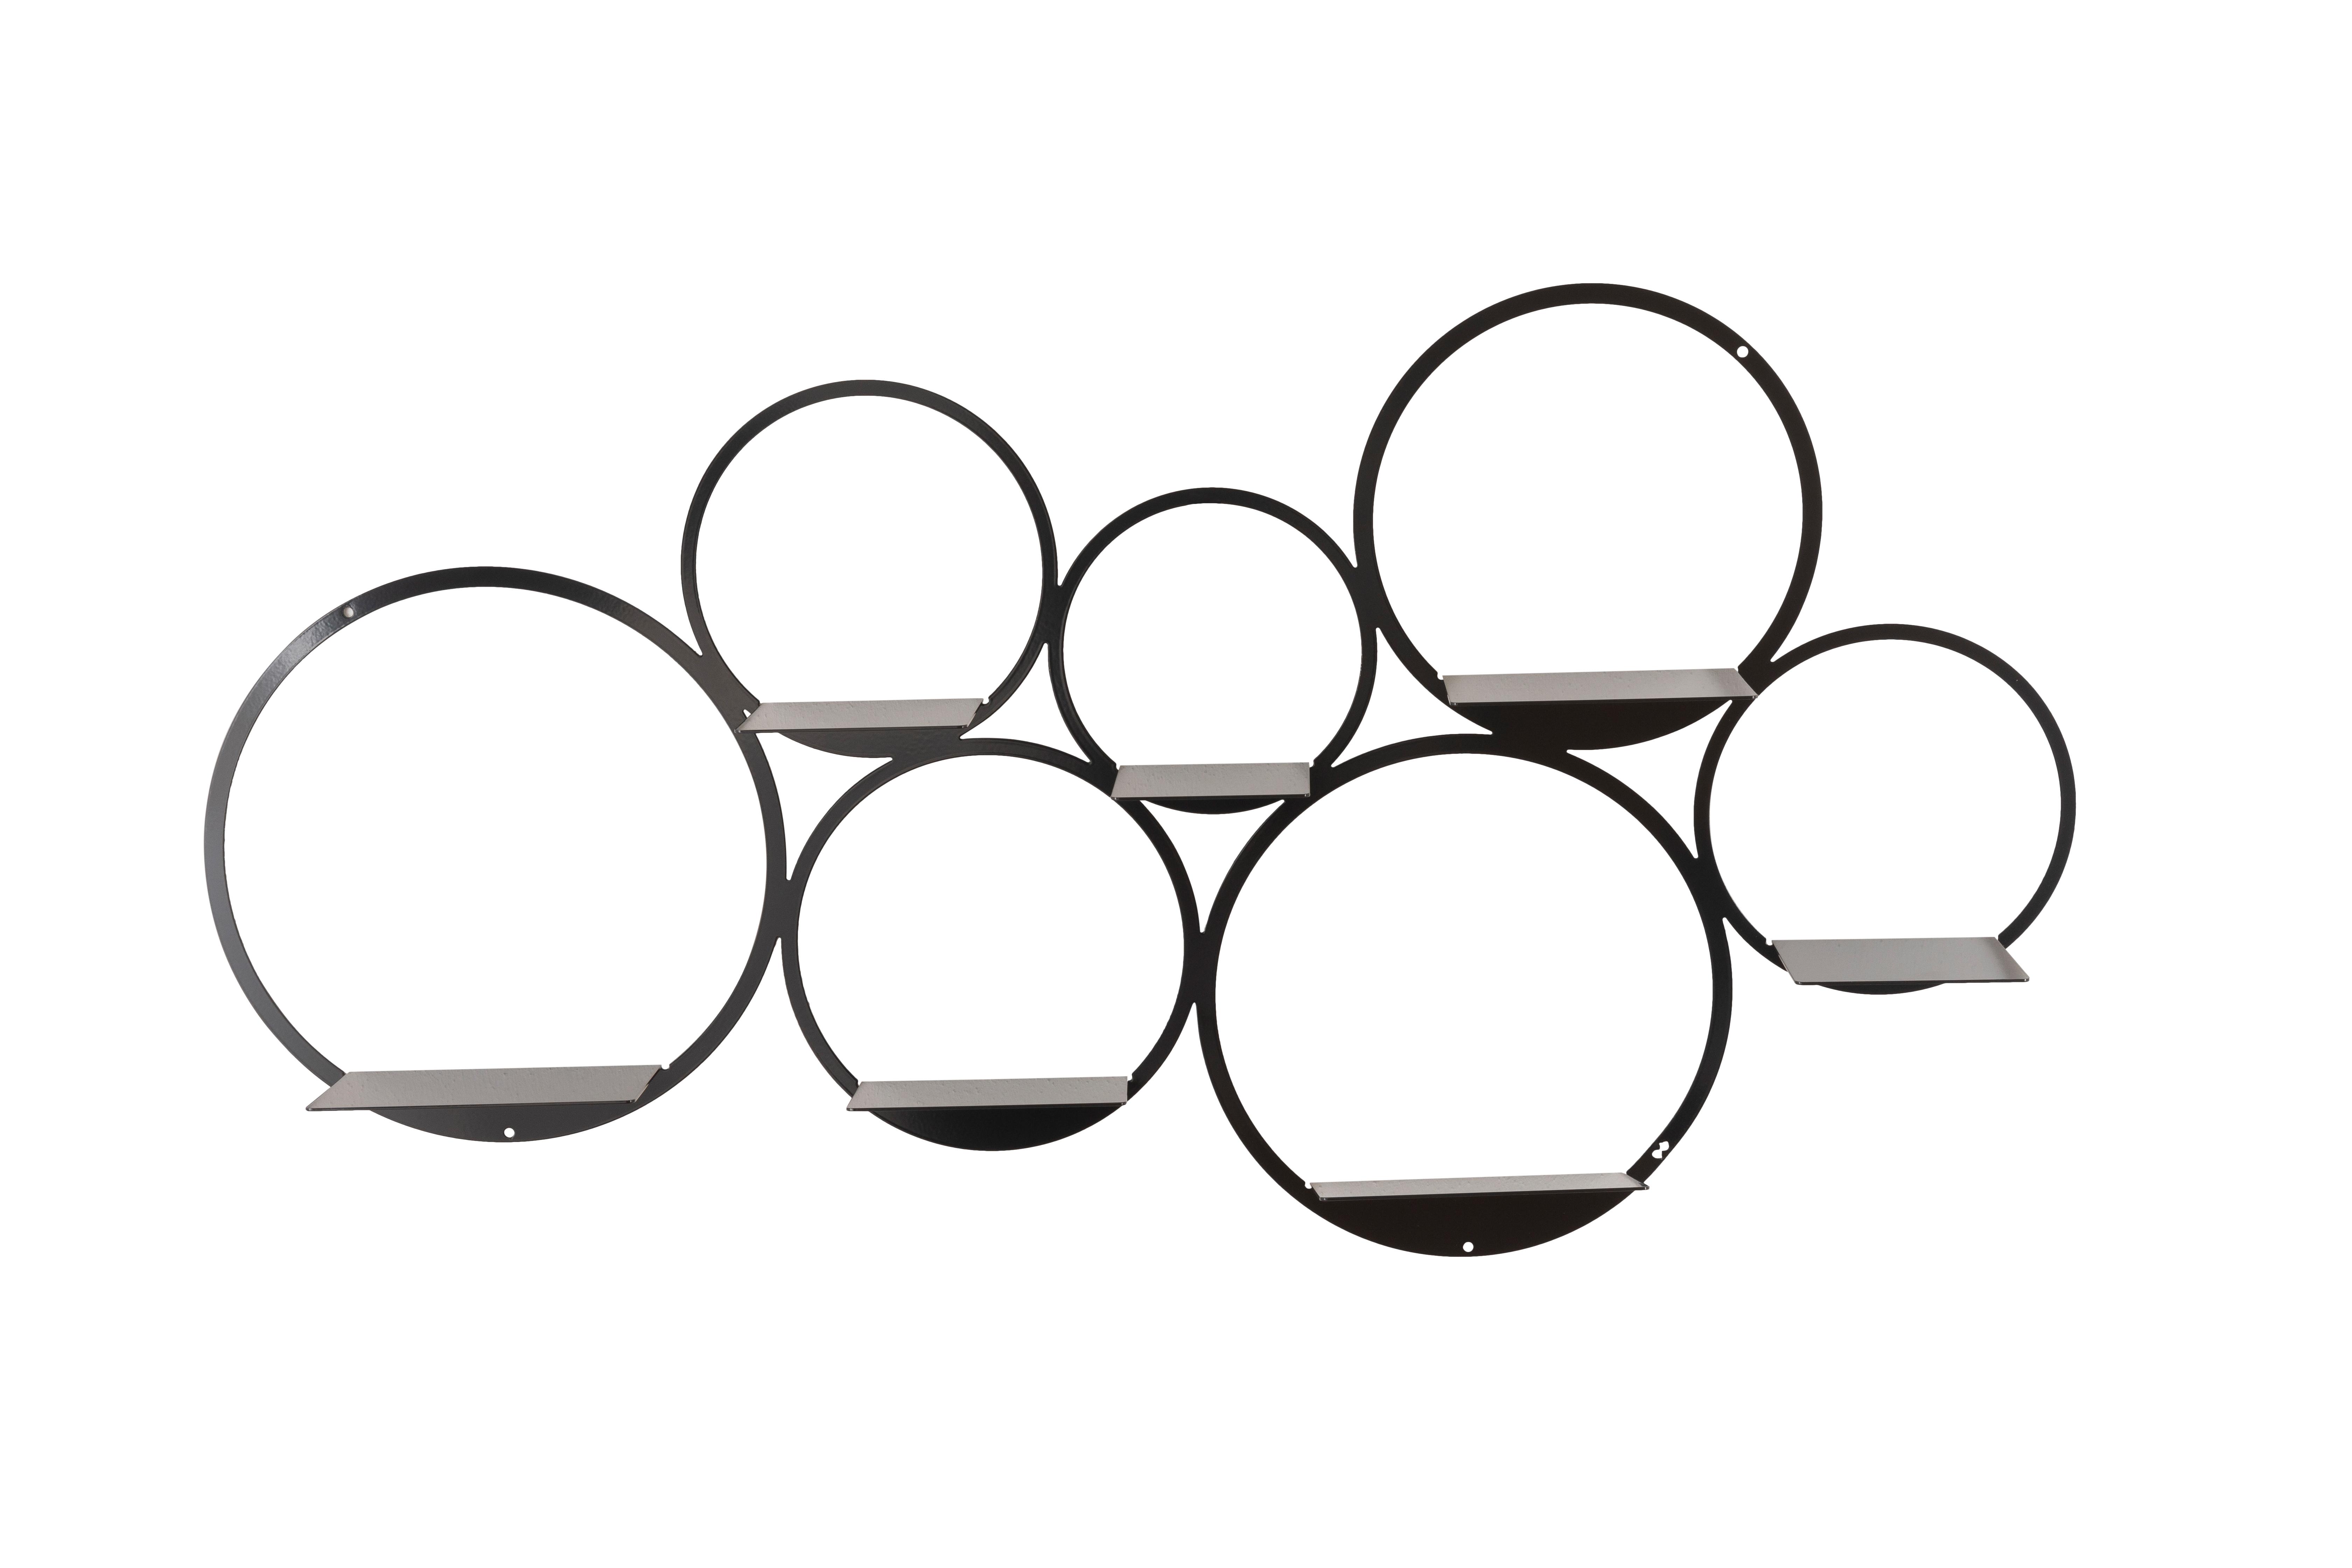 wanddecoratie gezette cirkels